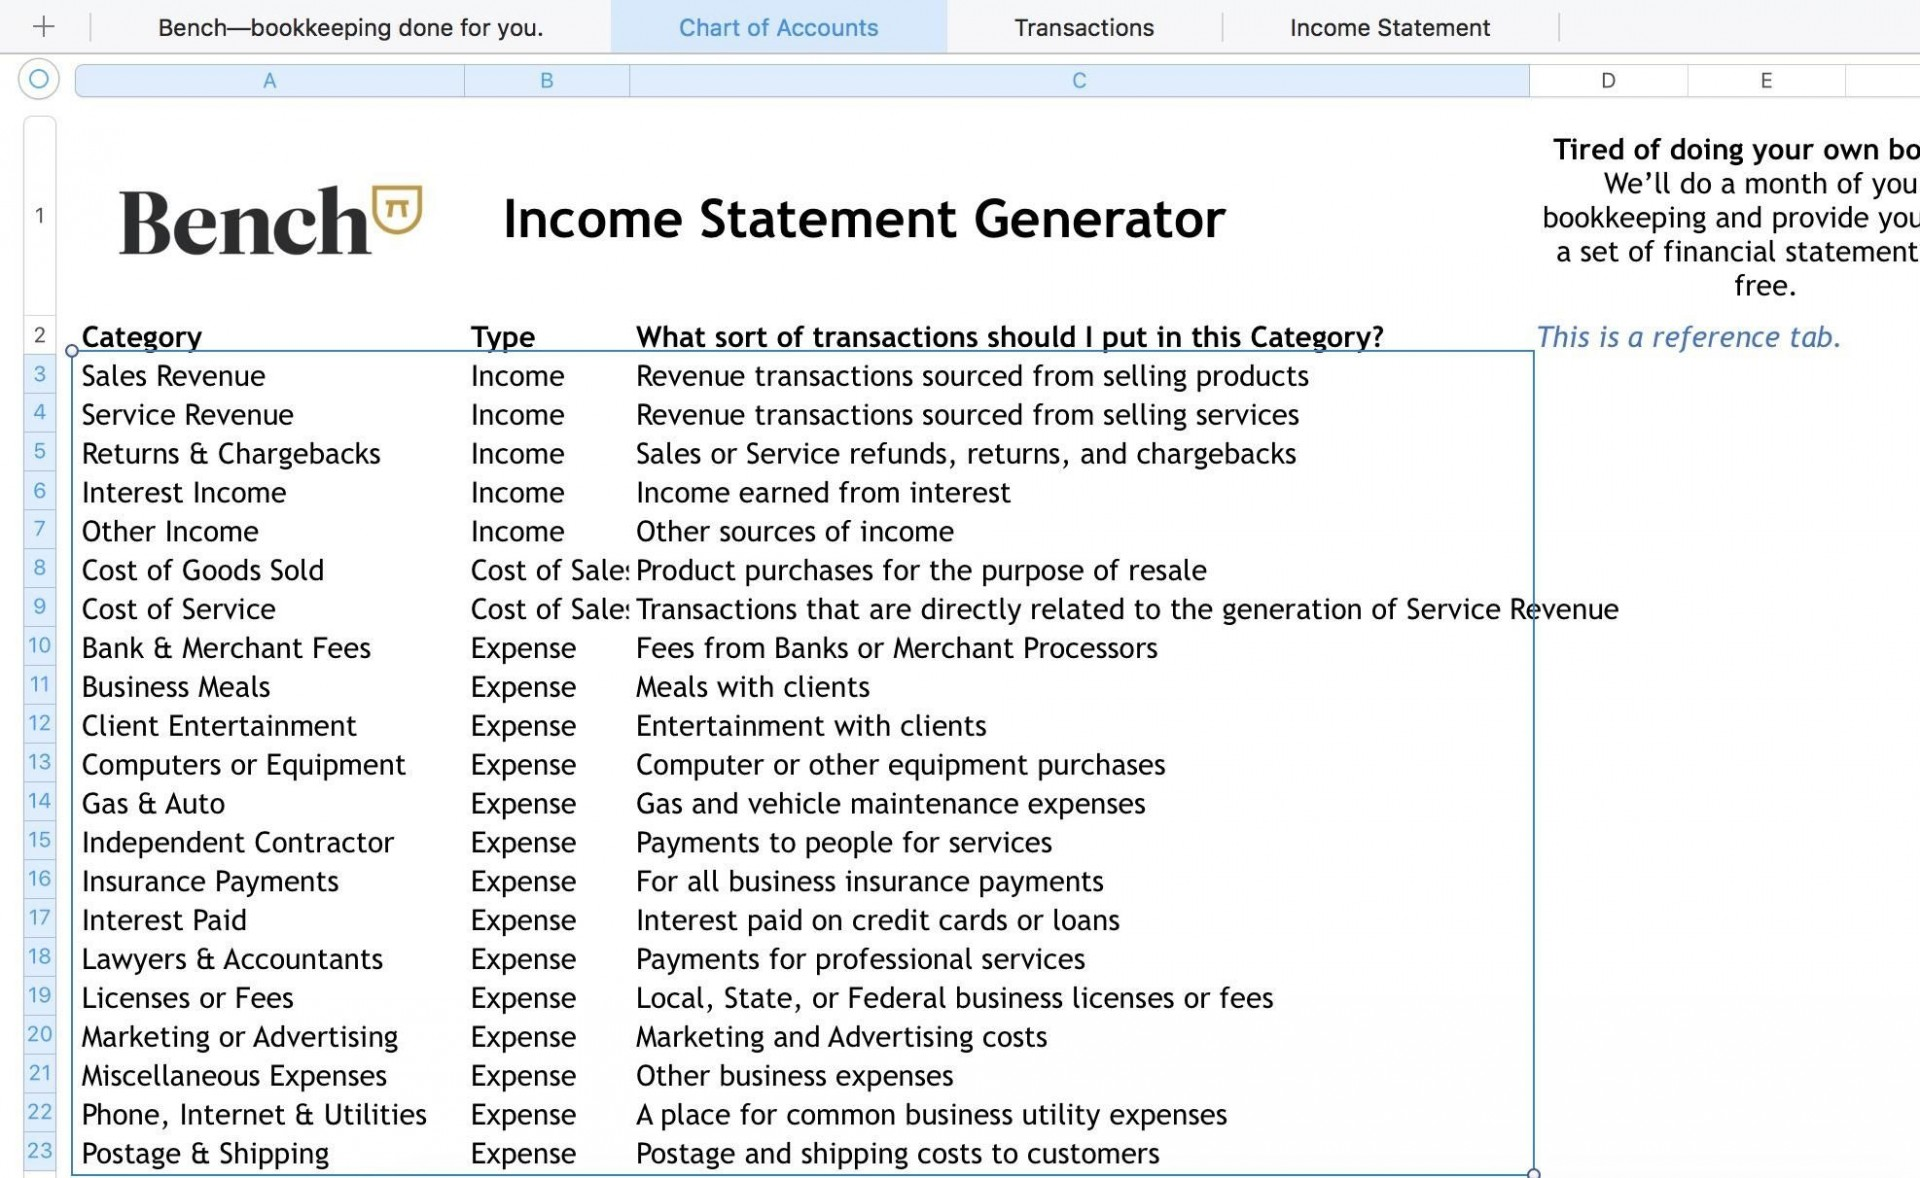 005 Unique Income Statement Format In Excel Download Idea 1920